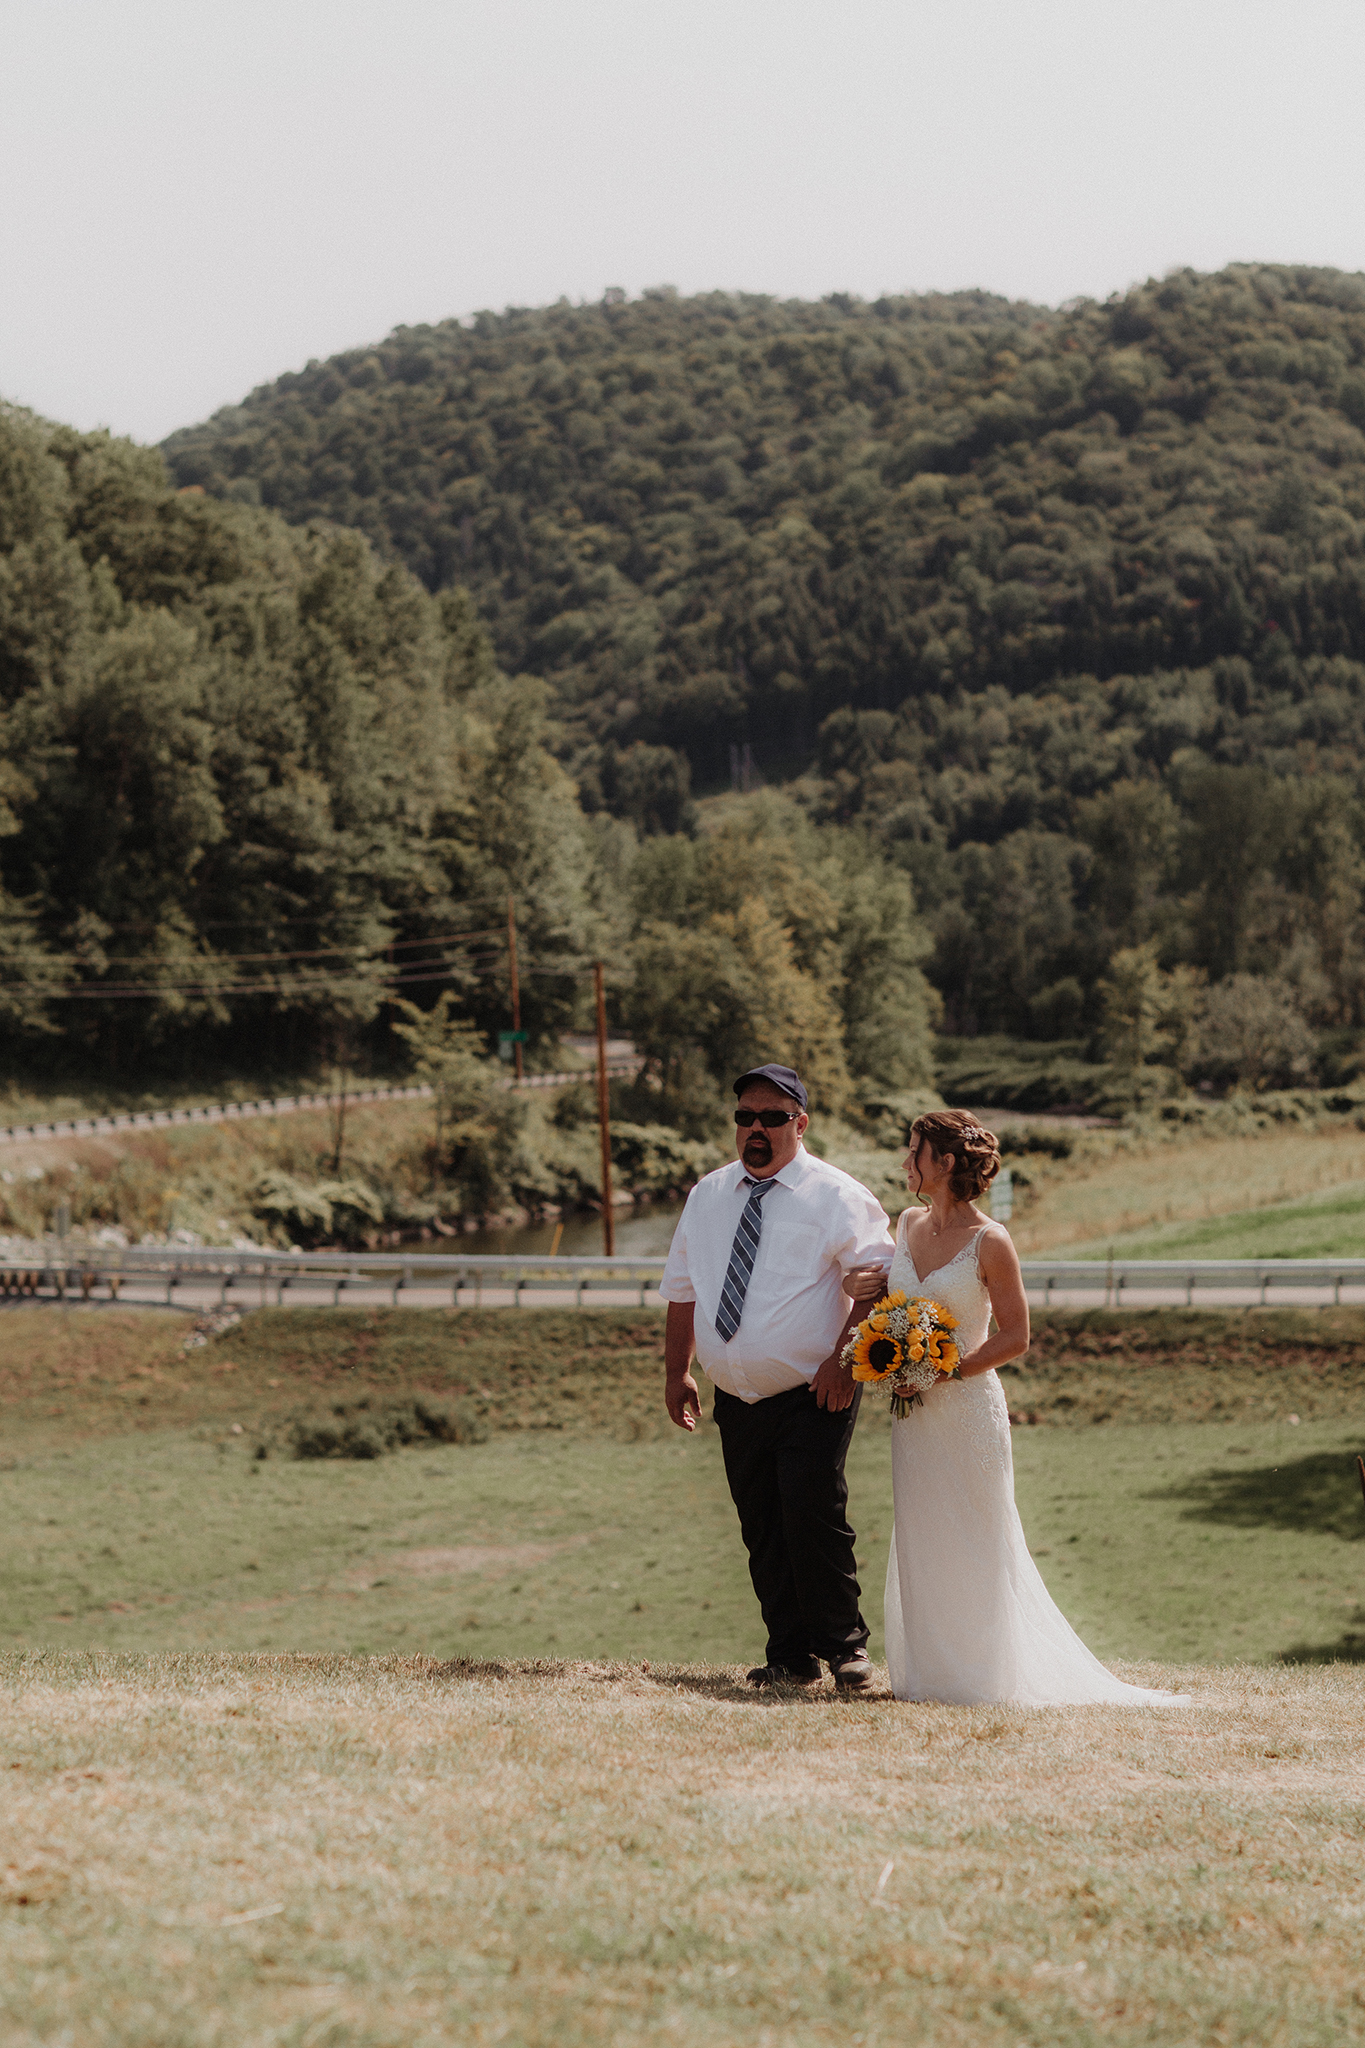 vermont-wedding-photographer-outdoor-farm-wedding-4.jpg